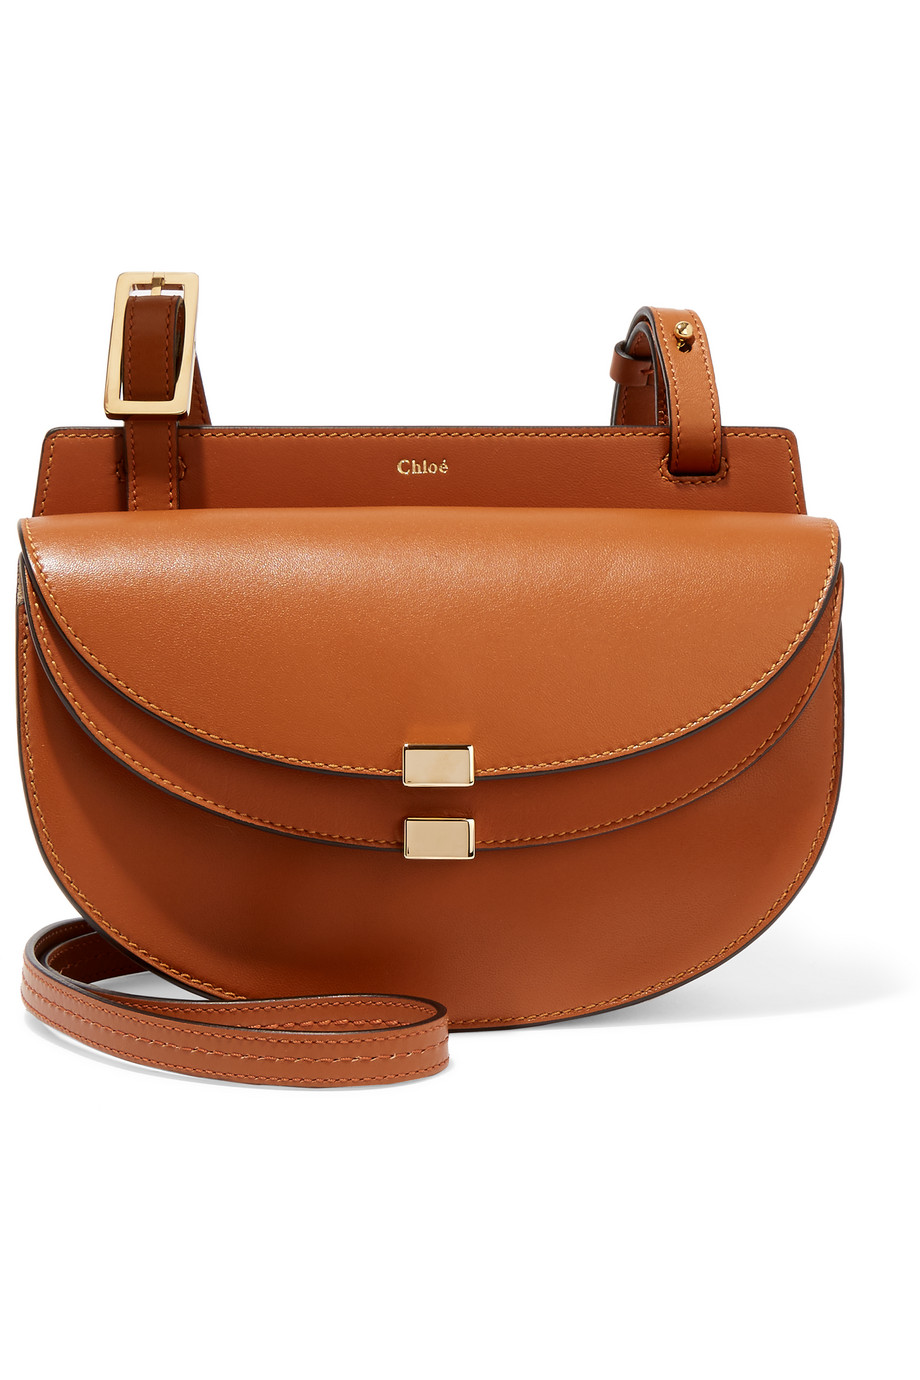 Chloé Georgia Mini Leather Shoulder Bag, Light Brown, Women's